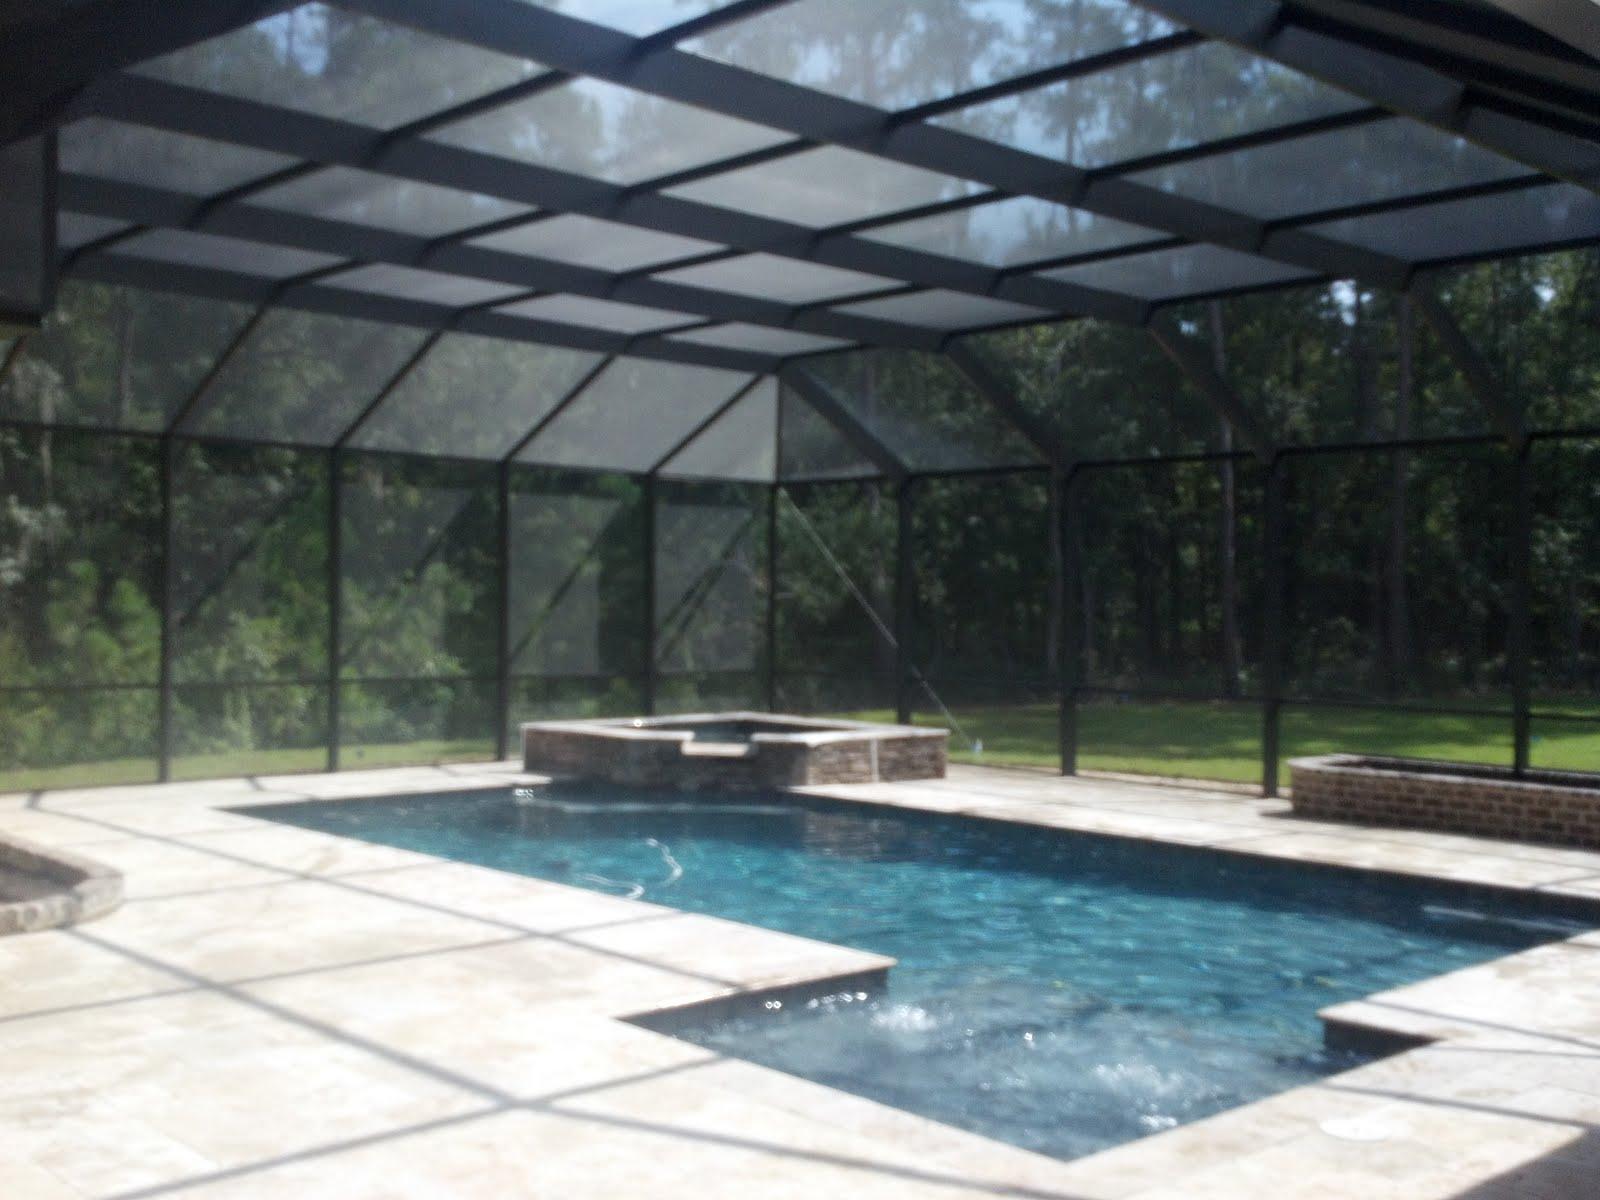 Pool enclosures usa custom pool enclosure for Pool design usa